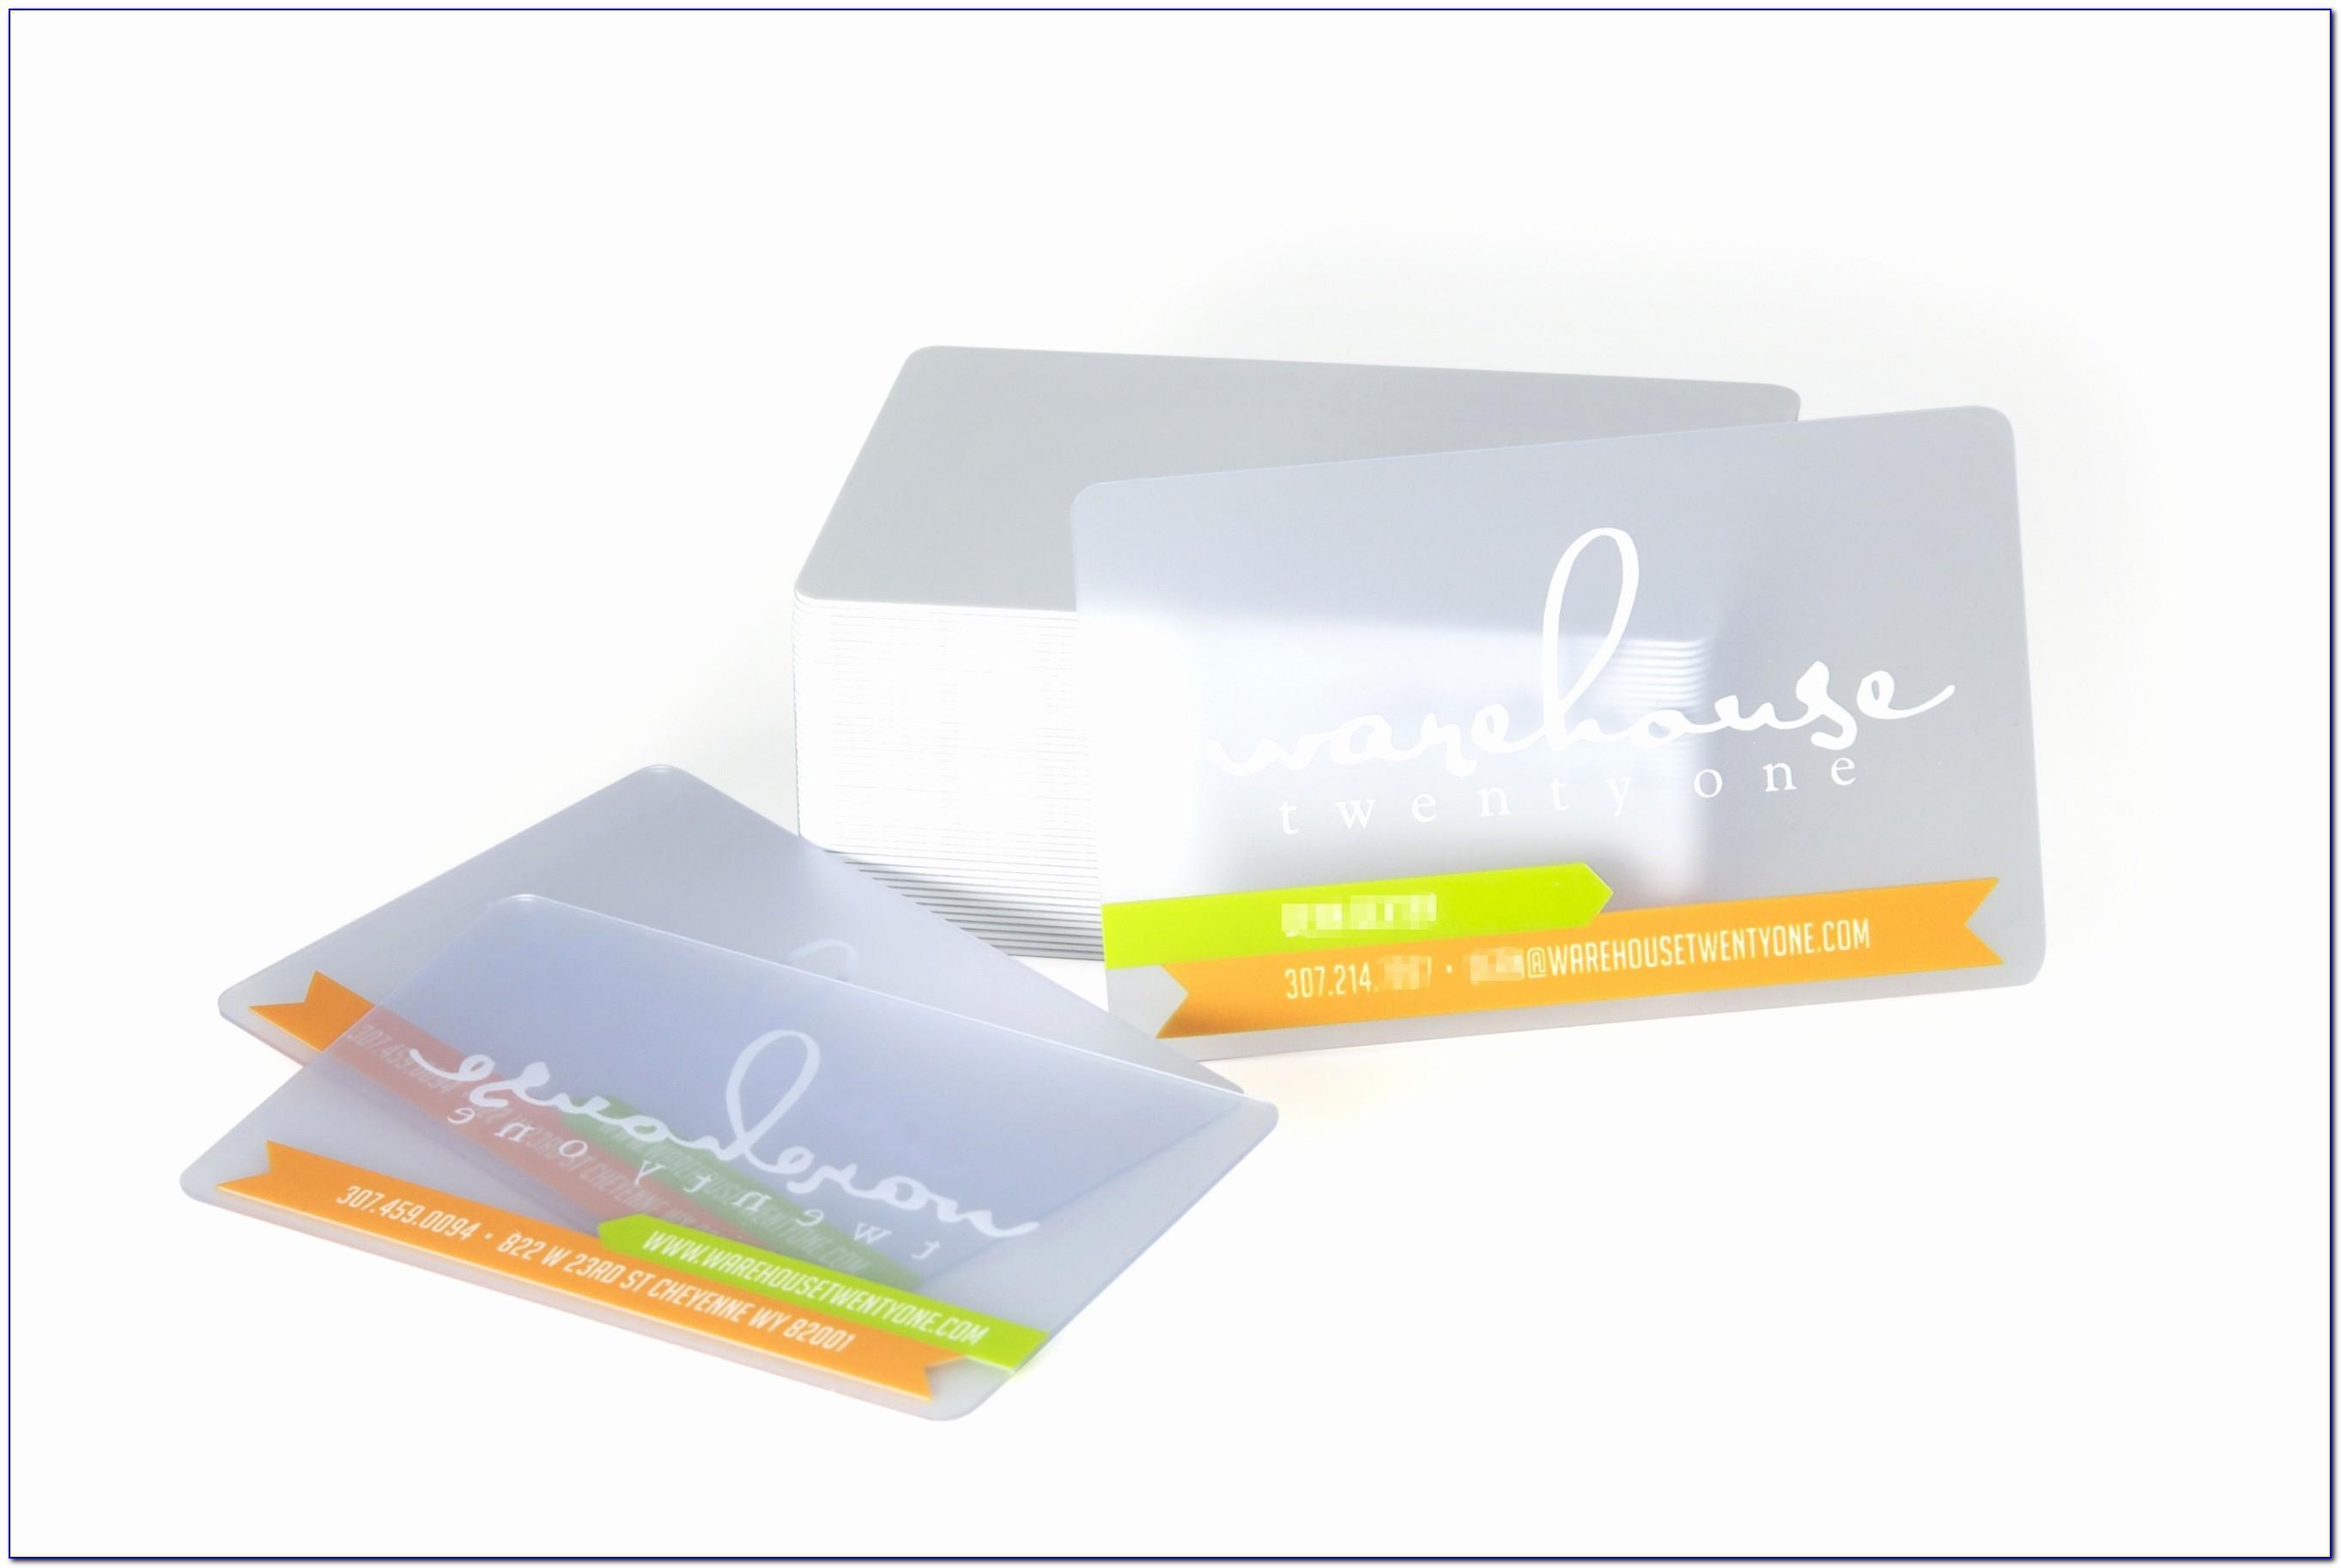 Vistaprint 500 Business Cards For 9.99 Code 2020